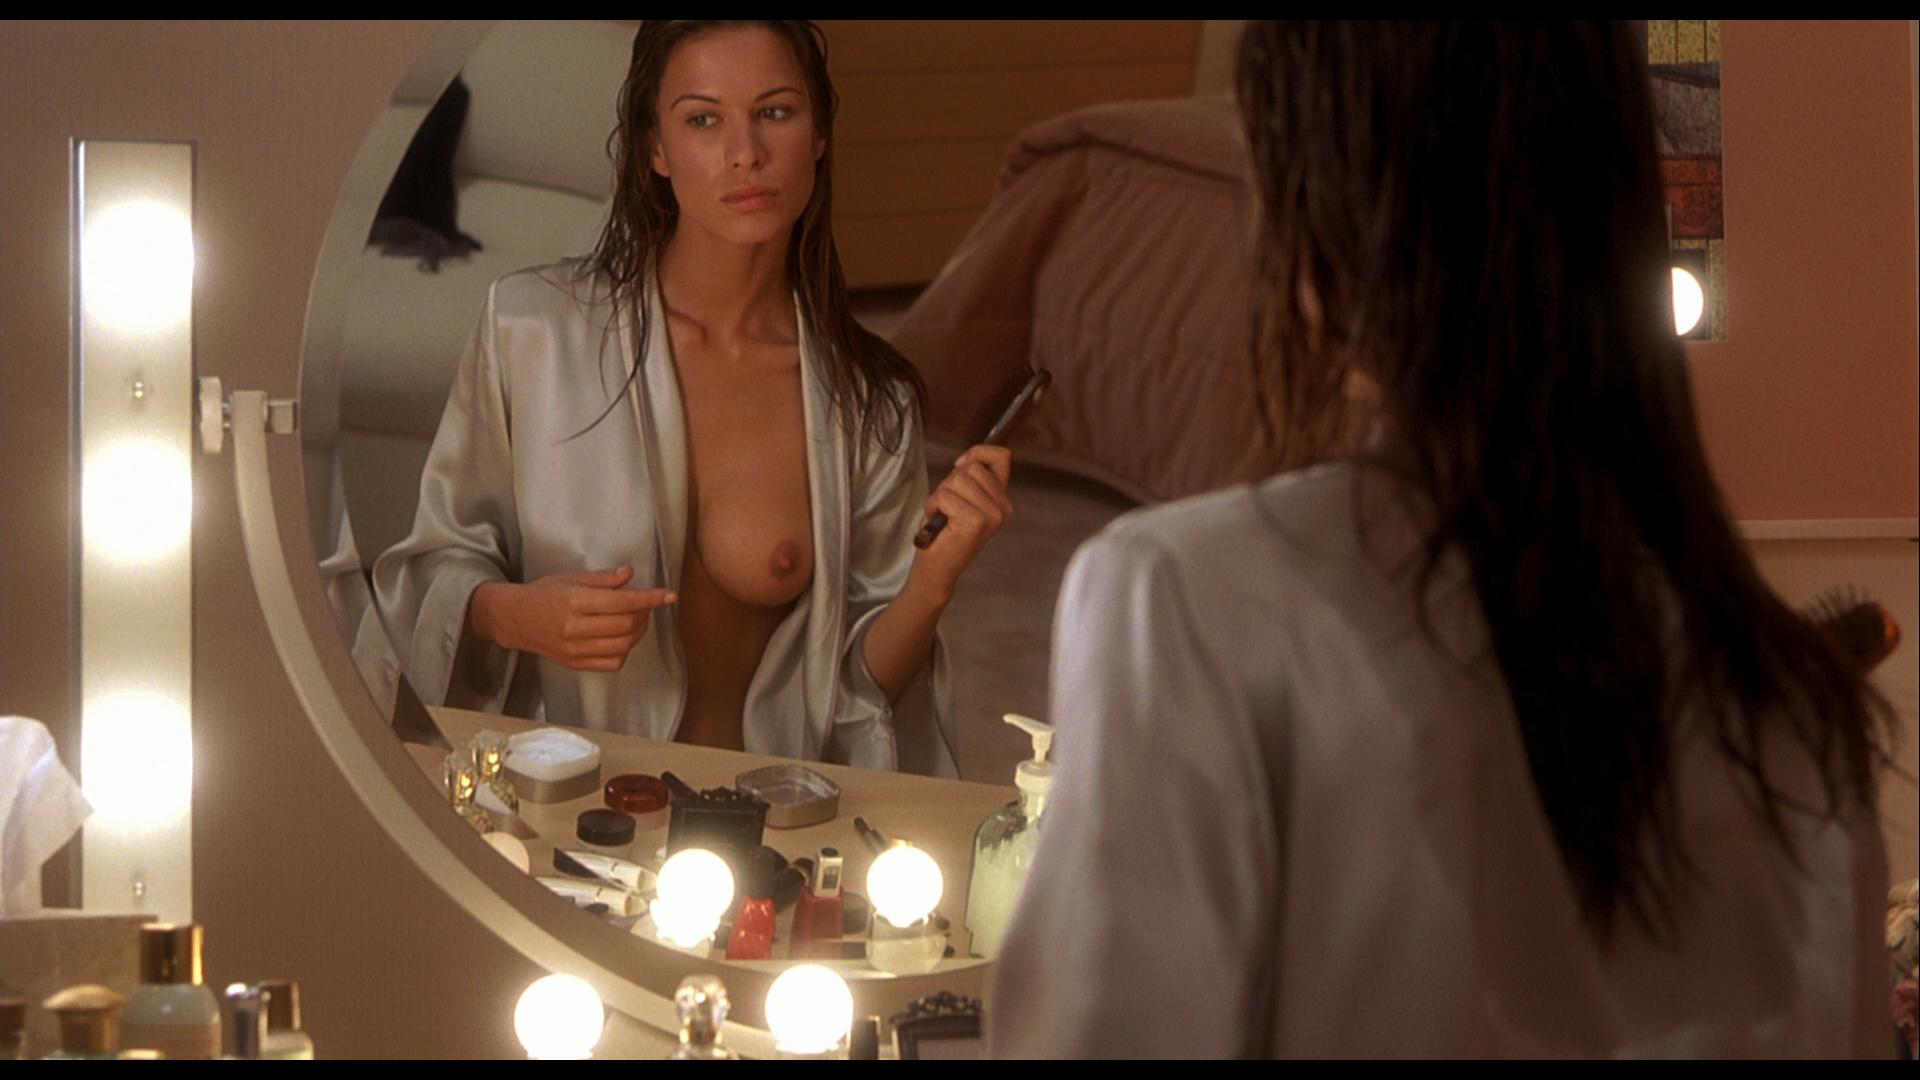 Hollowman nude scene images femalecelebrity